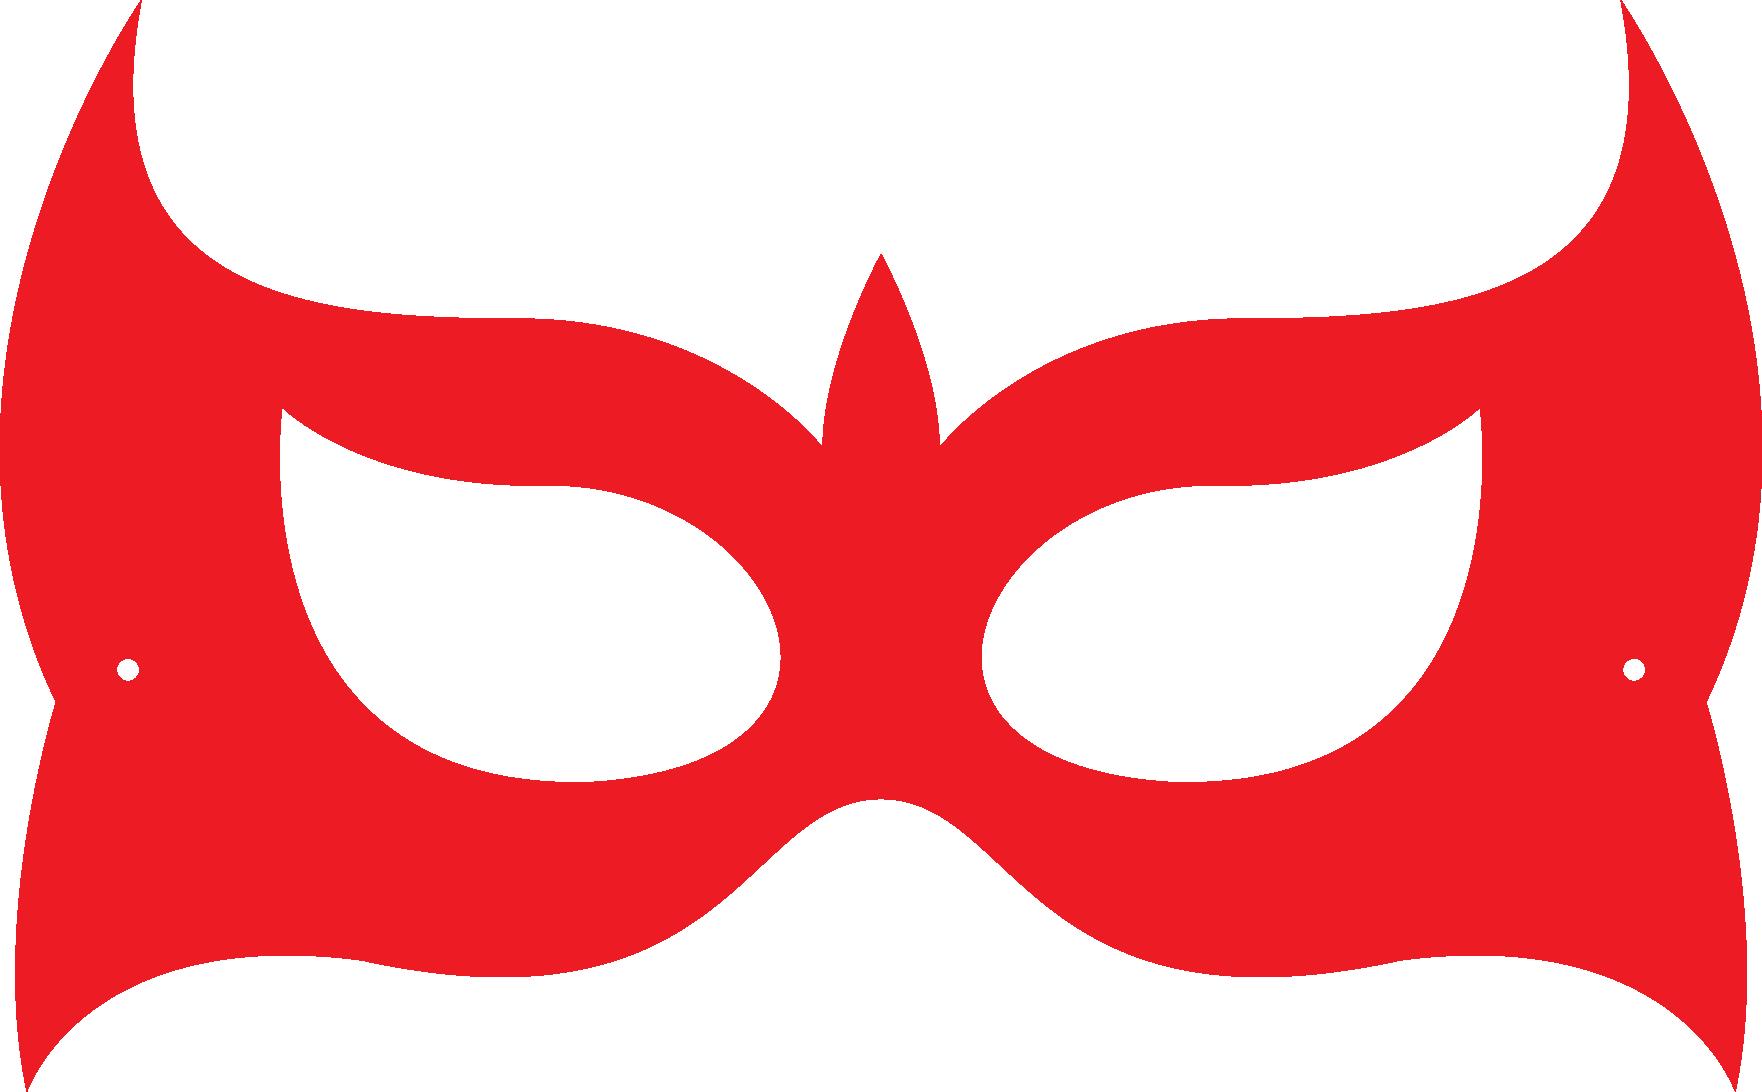 Mask Clipart Wolverine Free Collection Ninja Mask Clipart Clipart Email Clip Art Printable Halloween Masks Ninja Mask